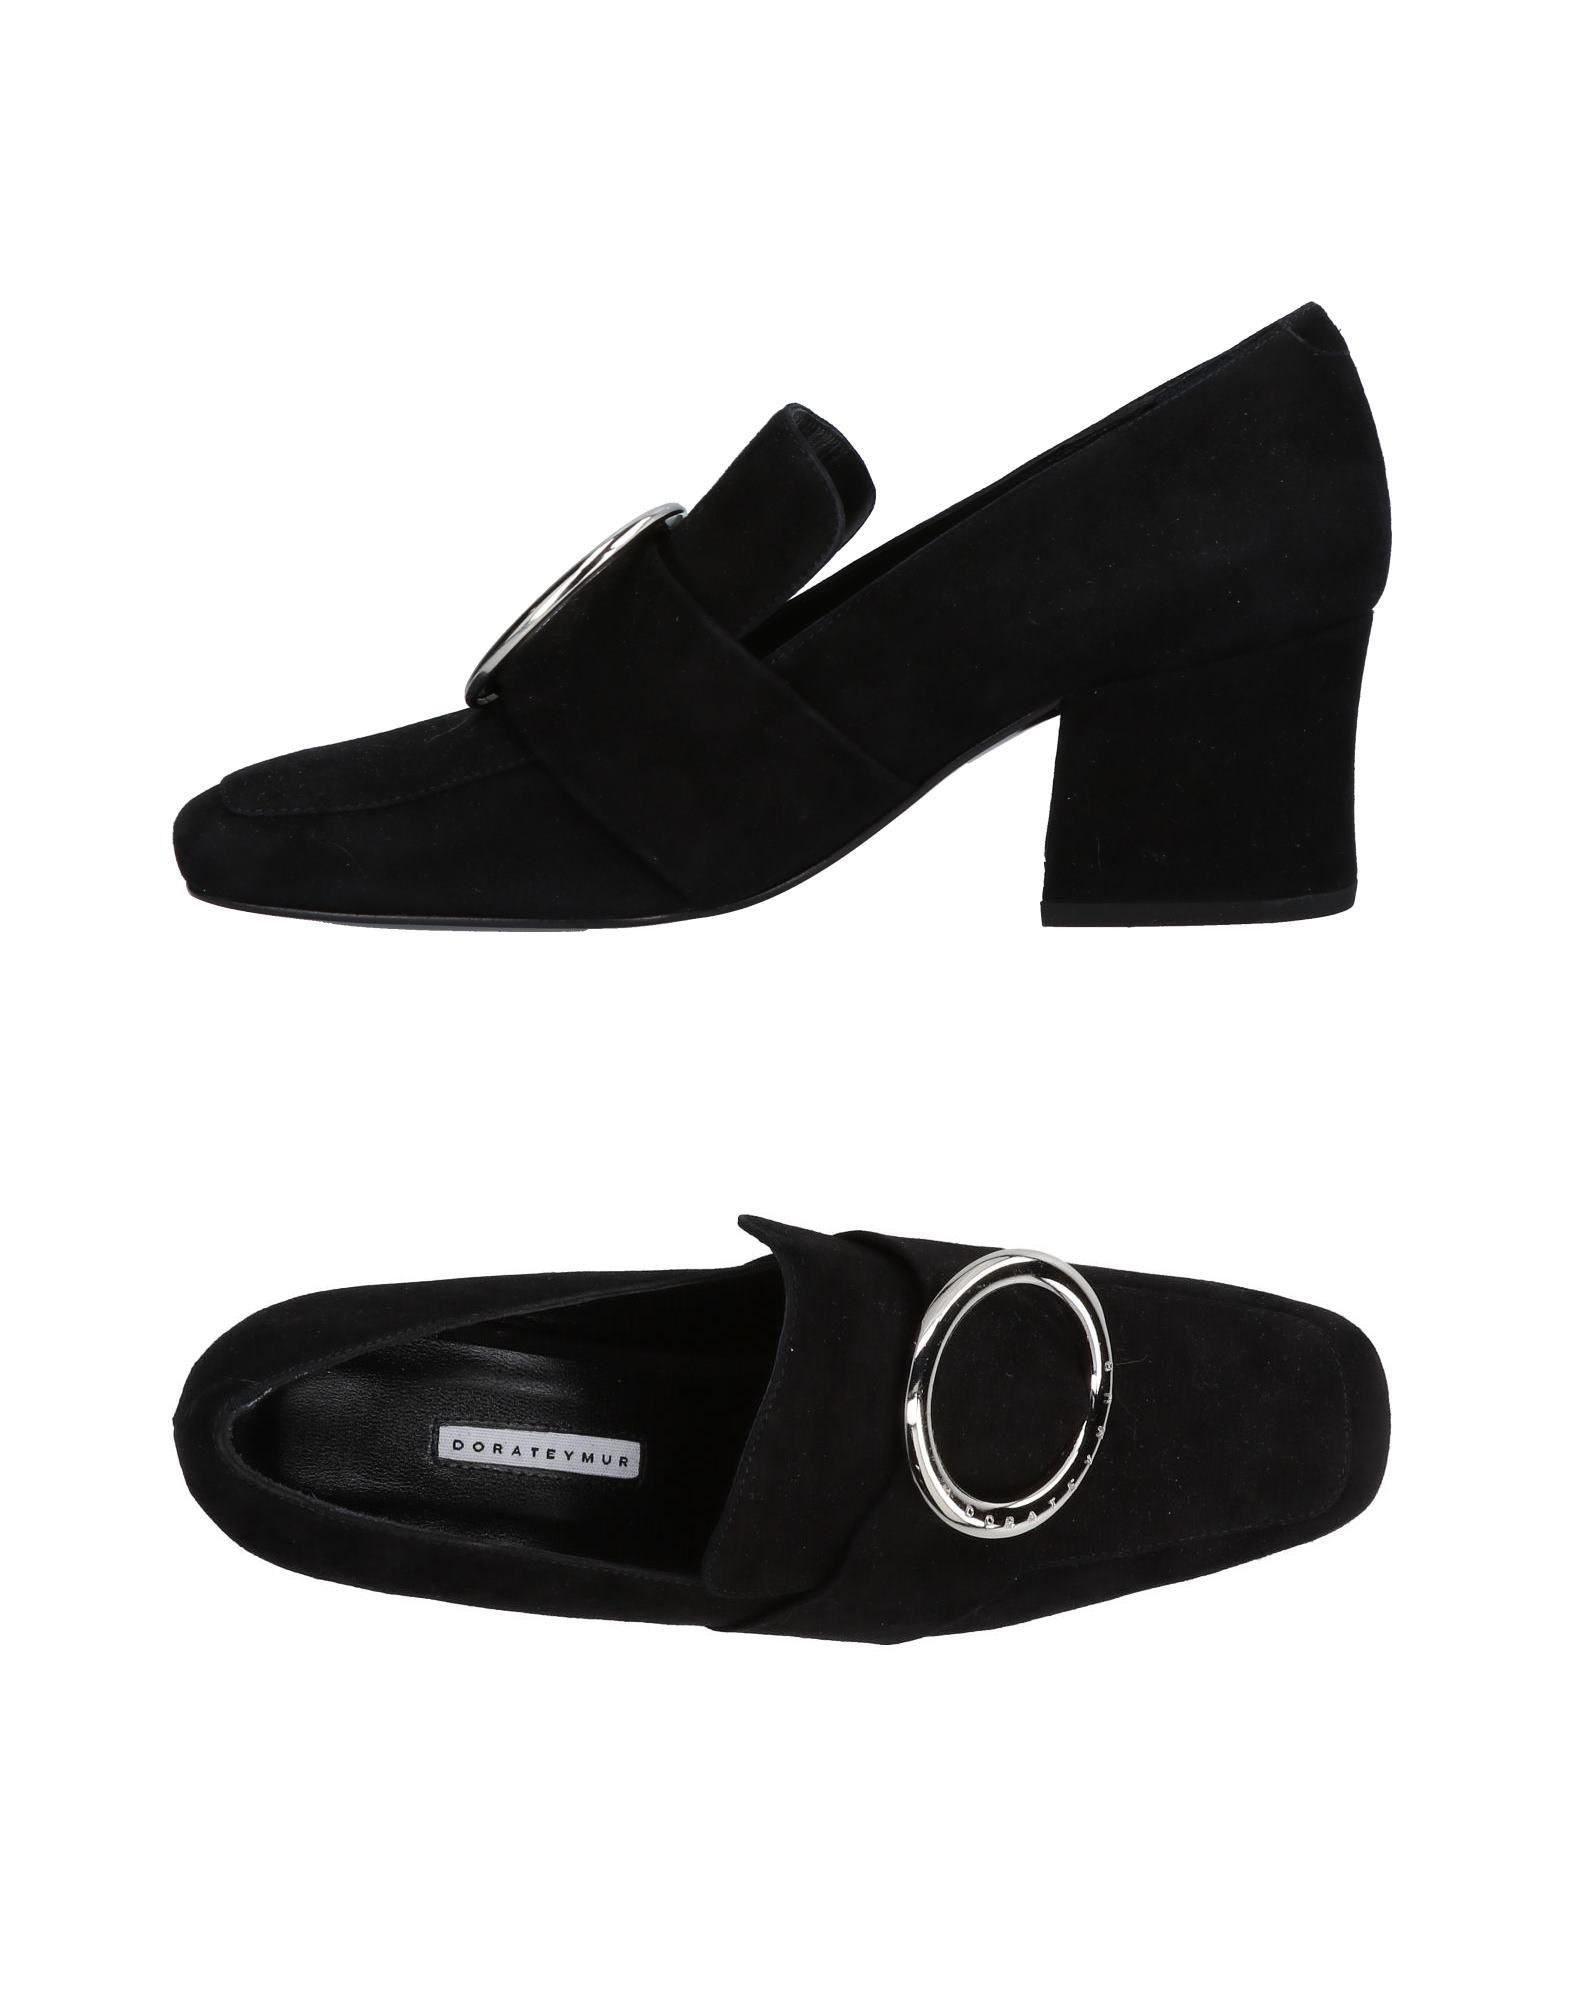 Dorateymur Mokassins Damen    11463822TN Heiße Schuhe 96642c